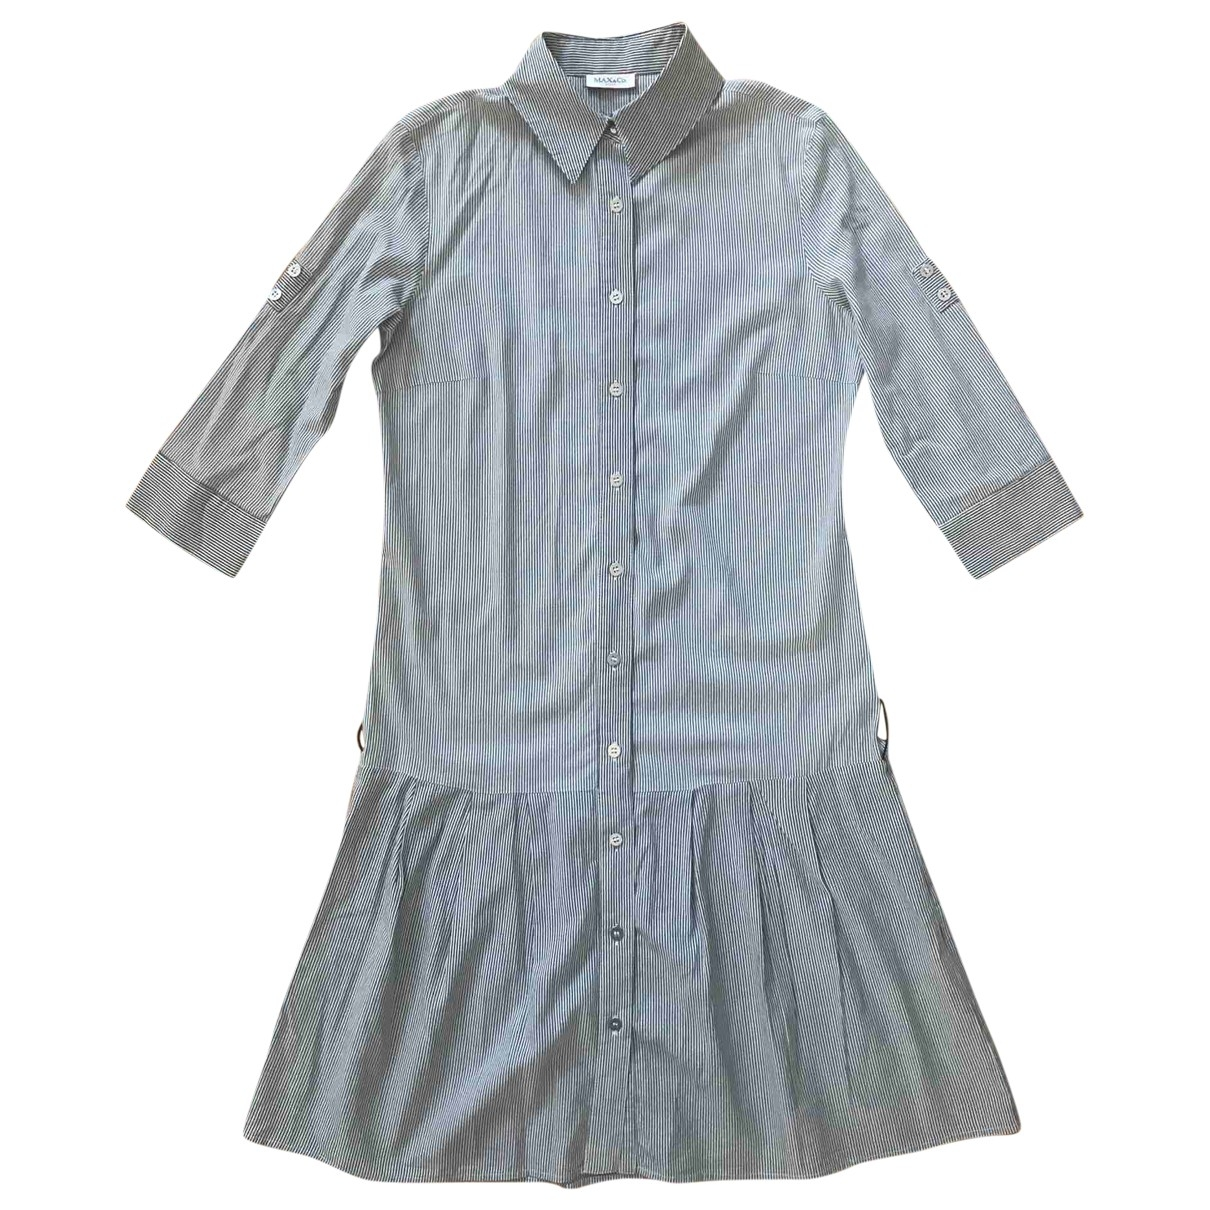 Max & Co \N White Cotton dress for Women 38 IT